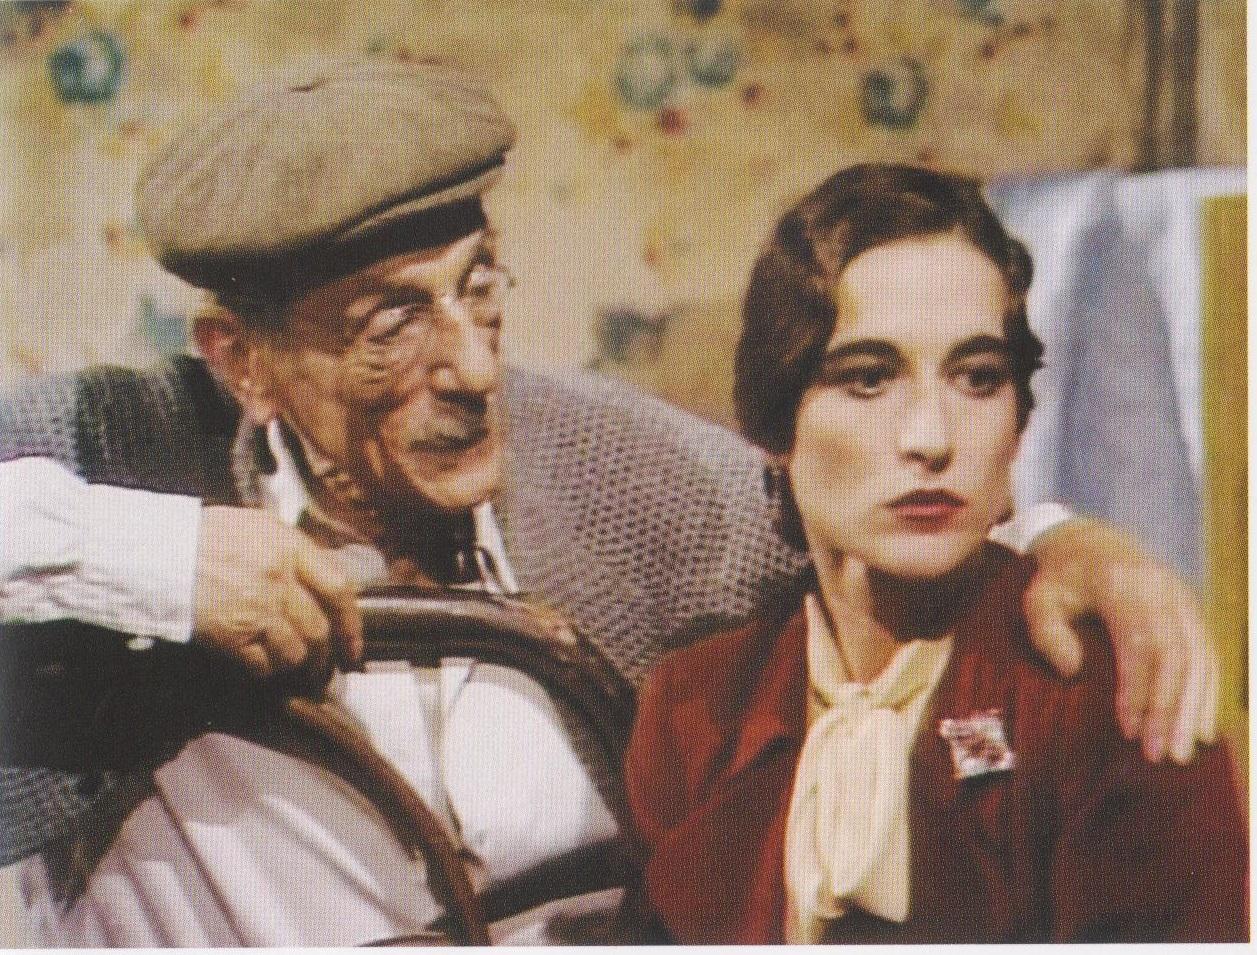 Tyron Leitso,Karan Ashley Erotic pics & movies Lise Simms,Tessie Agana (b. 1943)